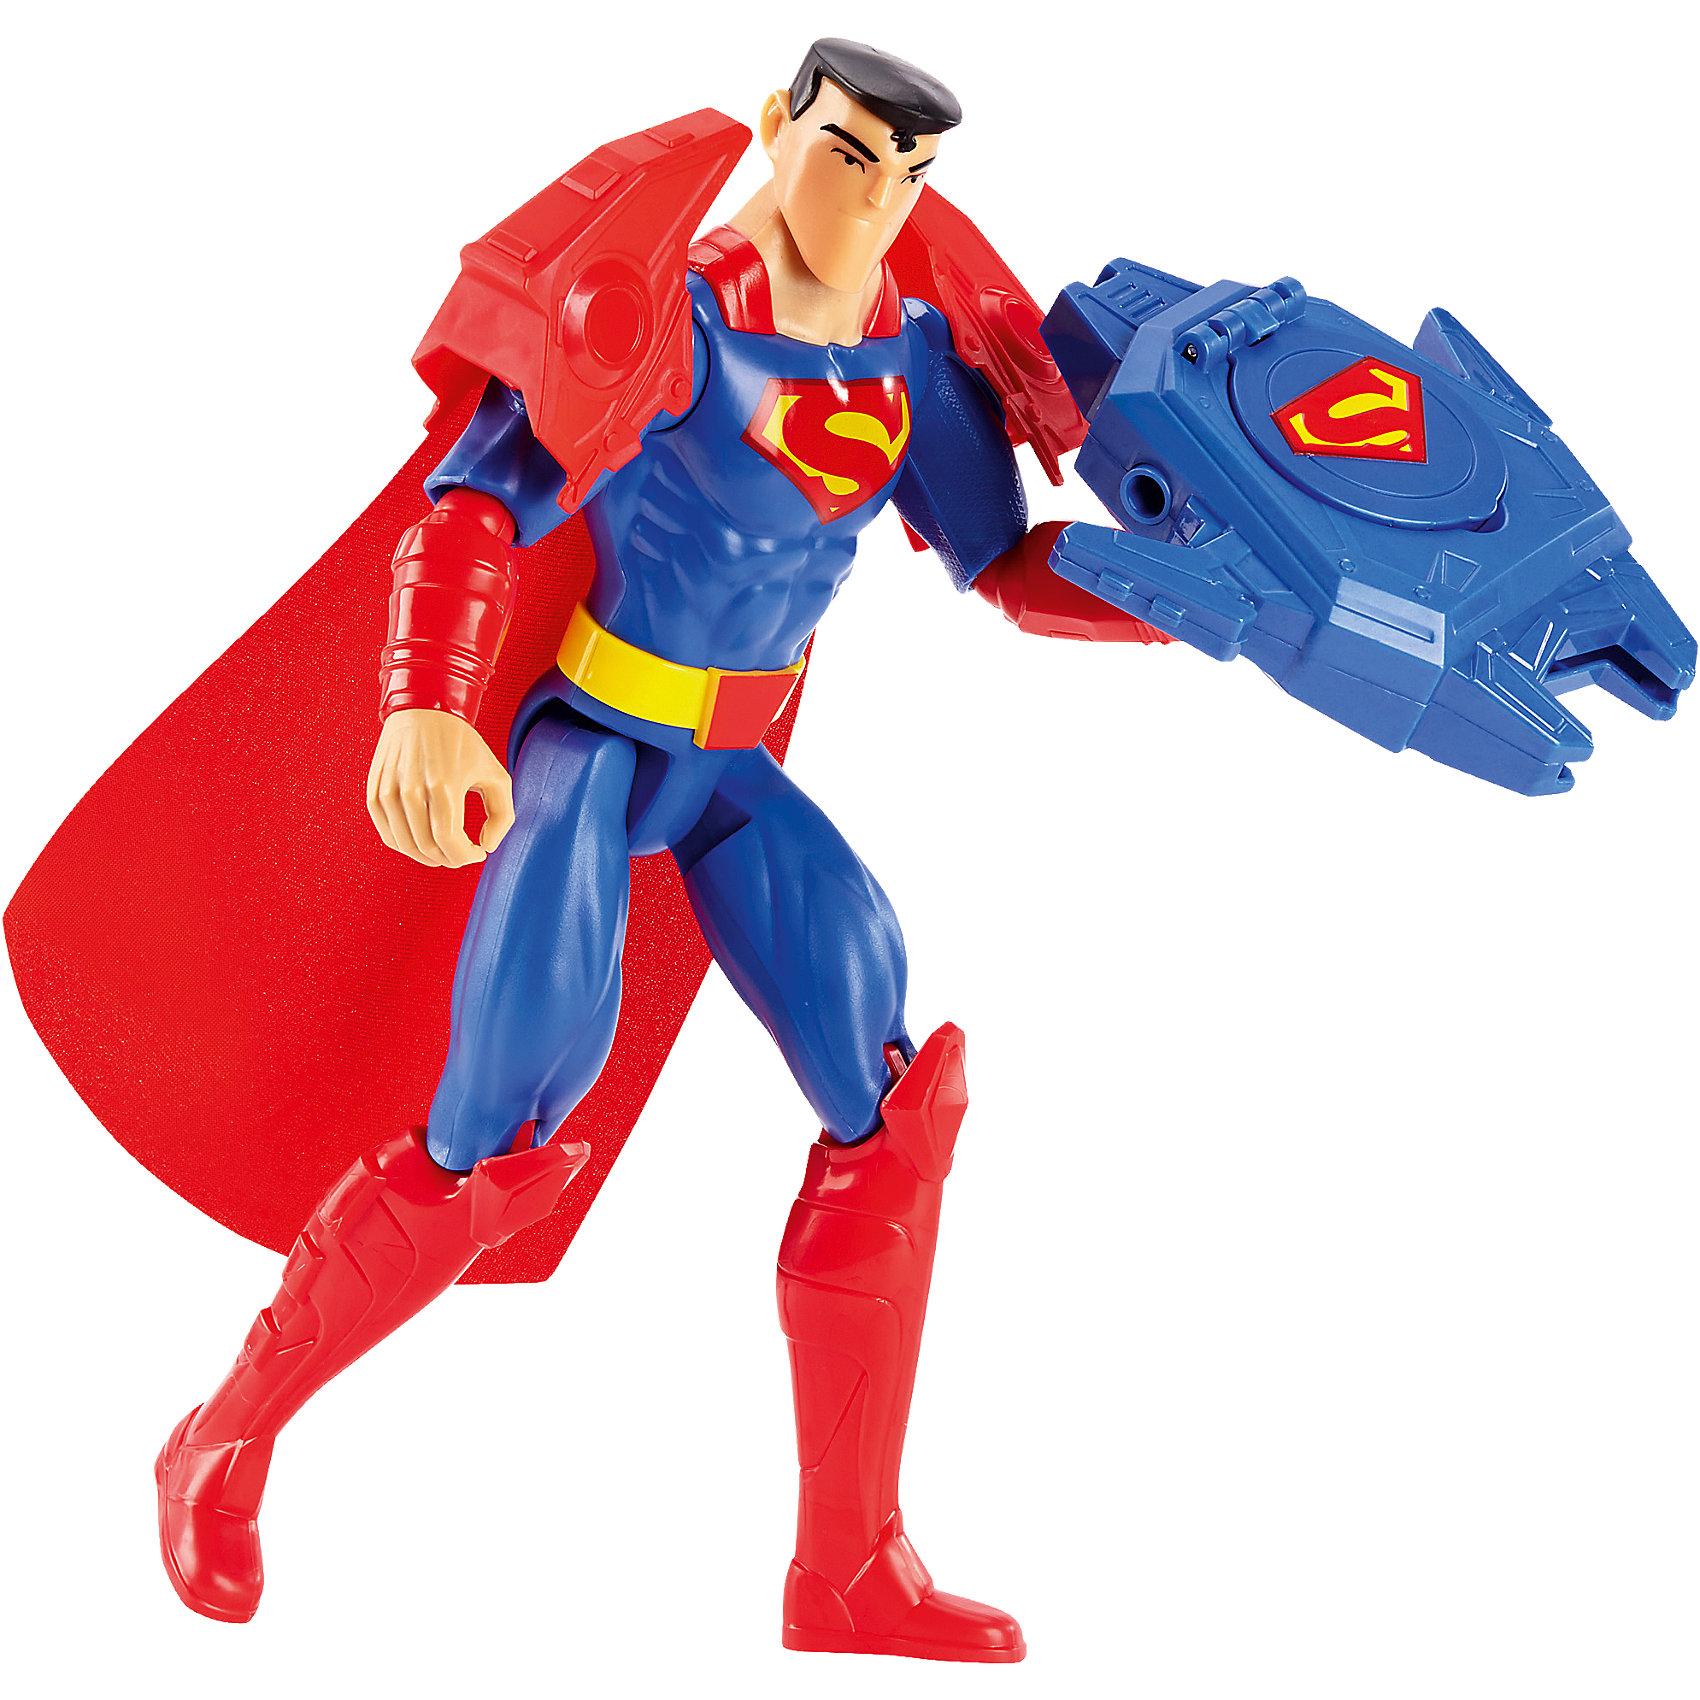 Фигурка Superman Armor Blast, БэтменЛюбимые герои<br><br><br>Ширина мм: 309<br>Глубина мм: 172<br>Высота мм: 96<br>Вес г: 413<br>Возраст от месяцев: 36<br>Возраст до месяцев: 96<br>Пол: Мужской<br>Возраст: Детский<br>SKU: 5197064